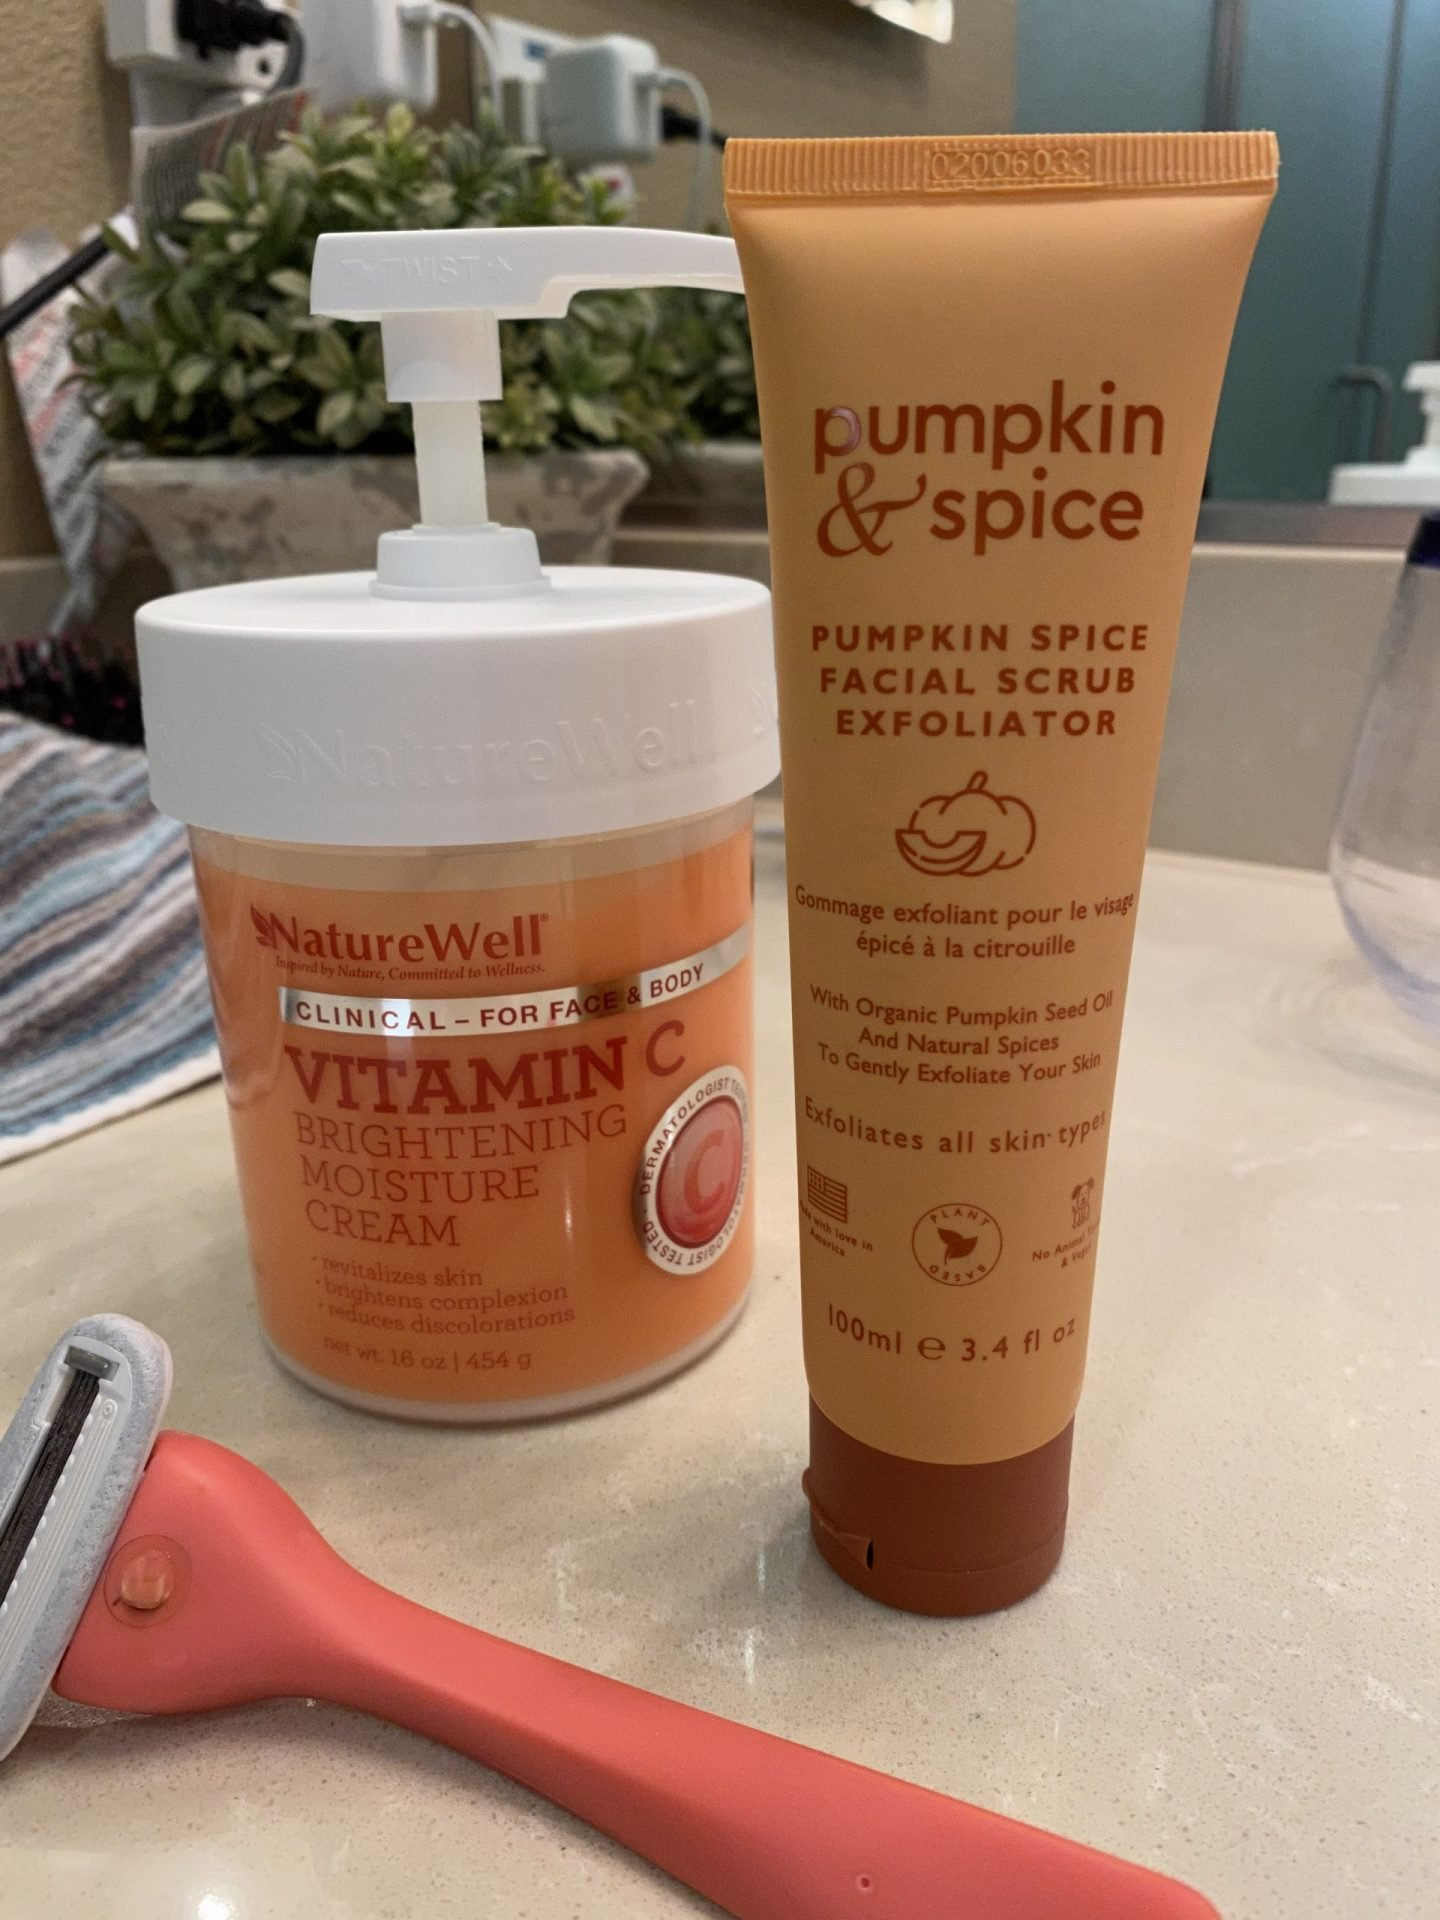 Pumpkin & Spice Exfoliator